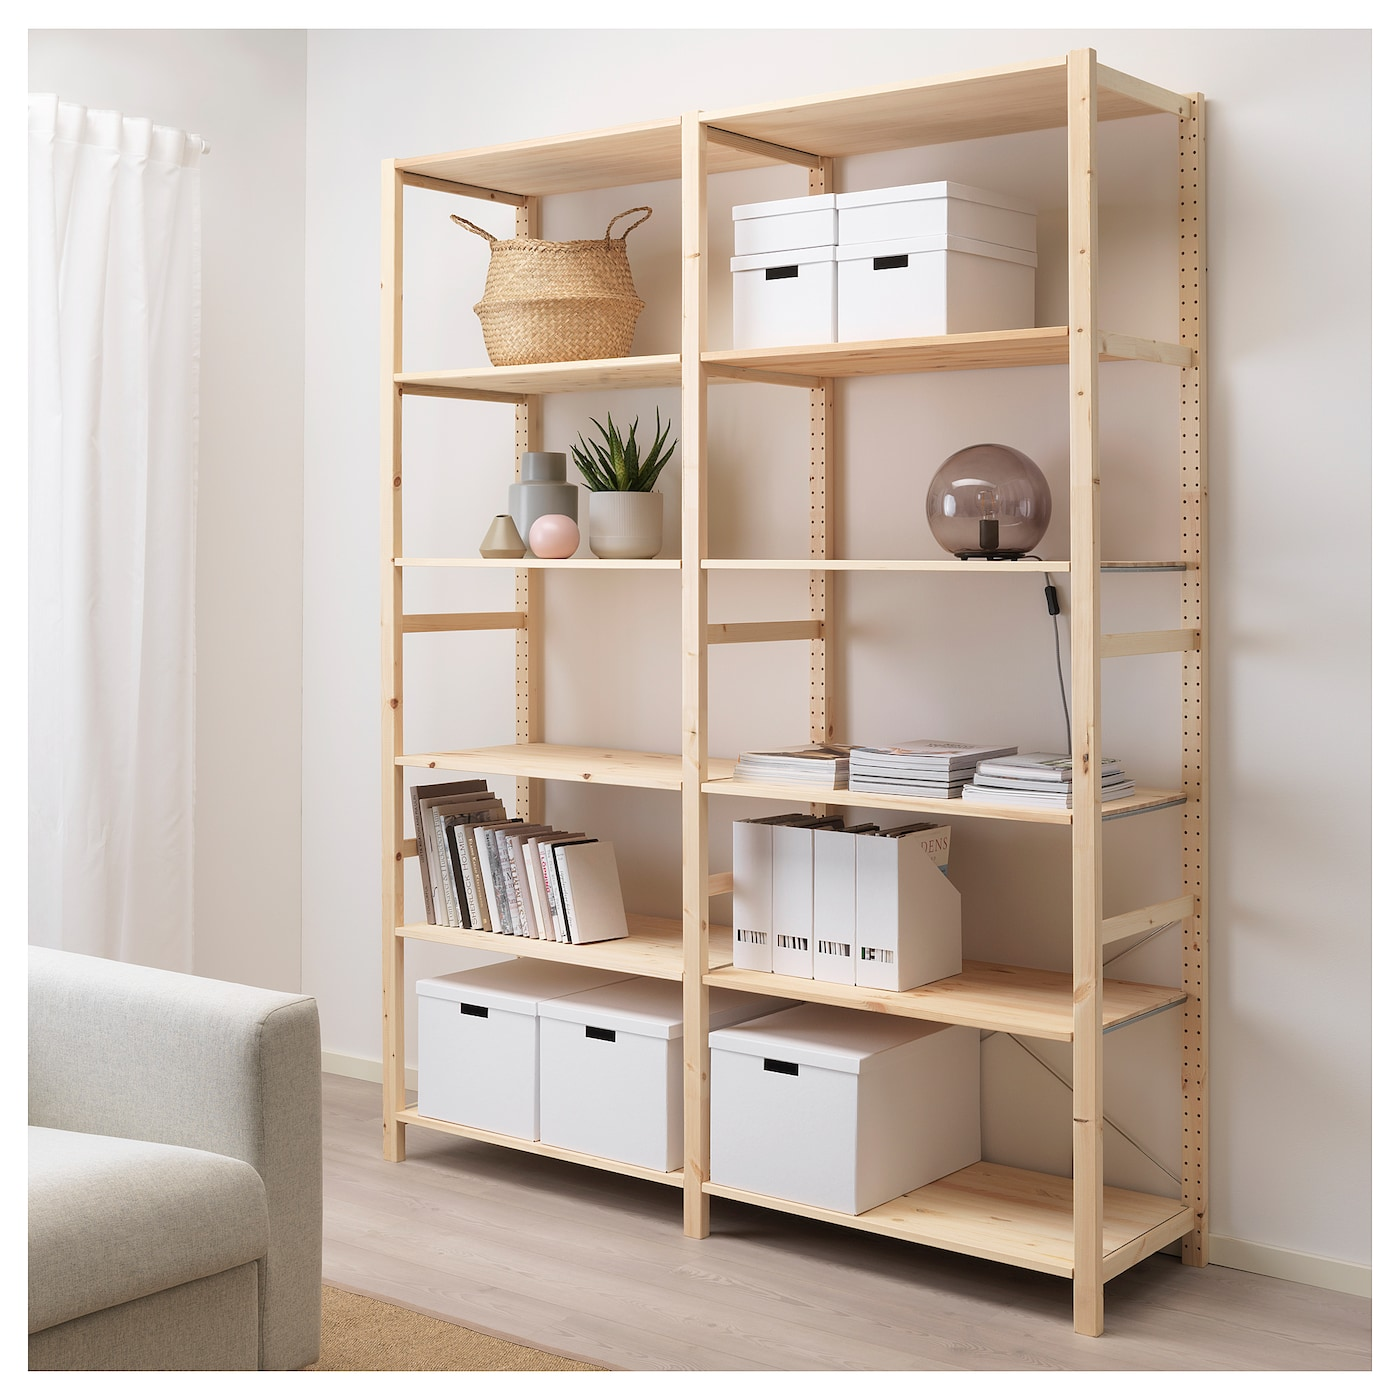 IVAR 2 Elem/Regale   Kiefer   IKEA Österreich